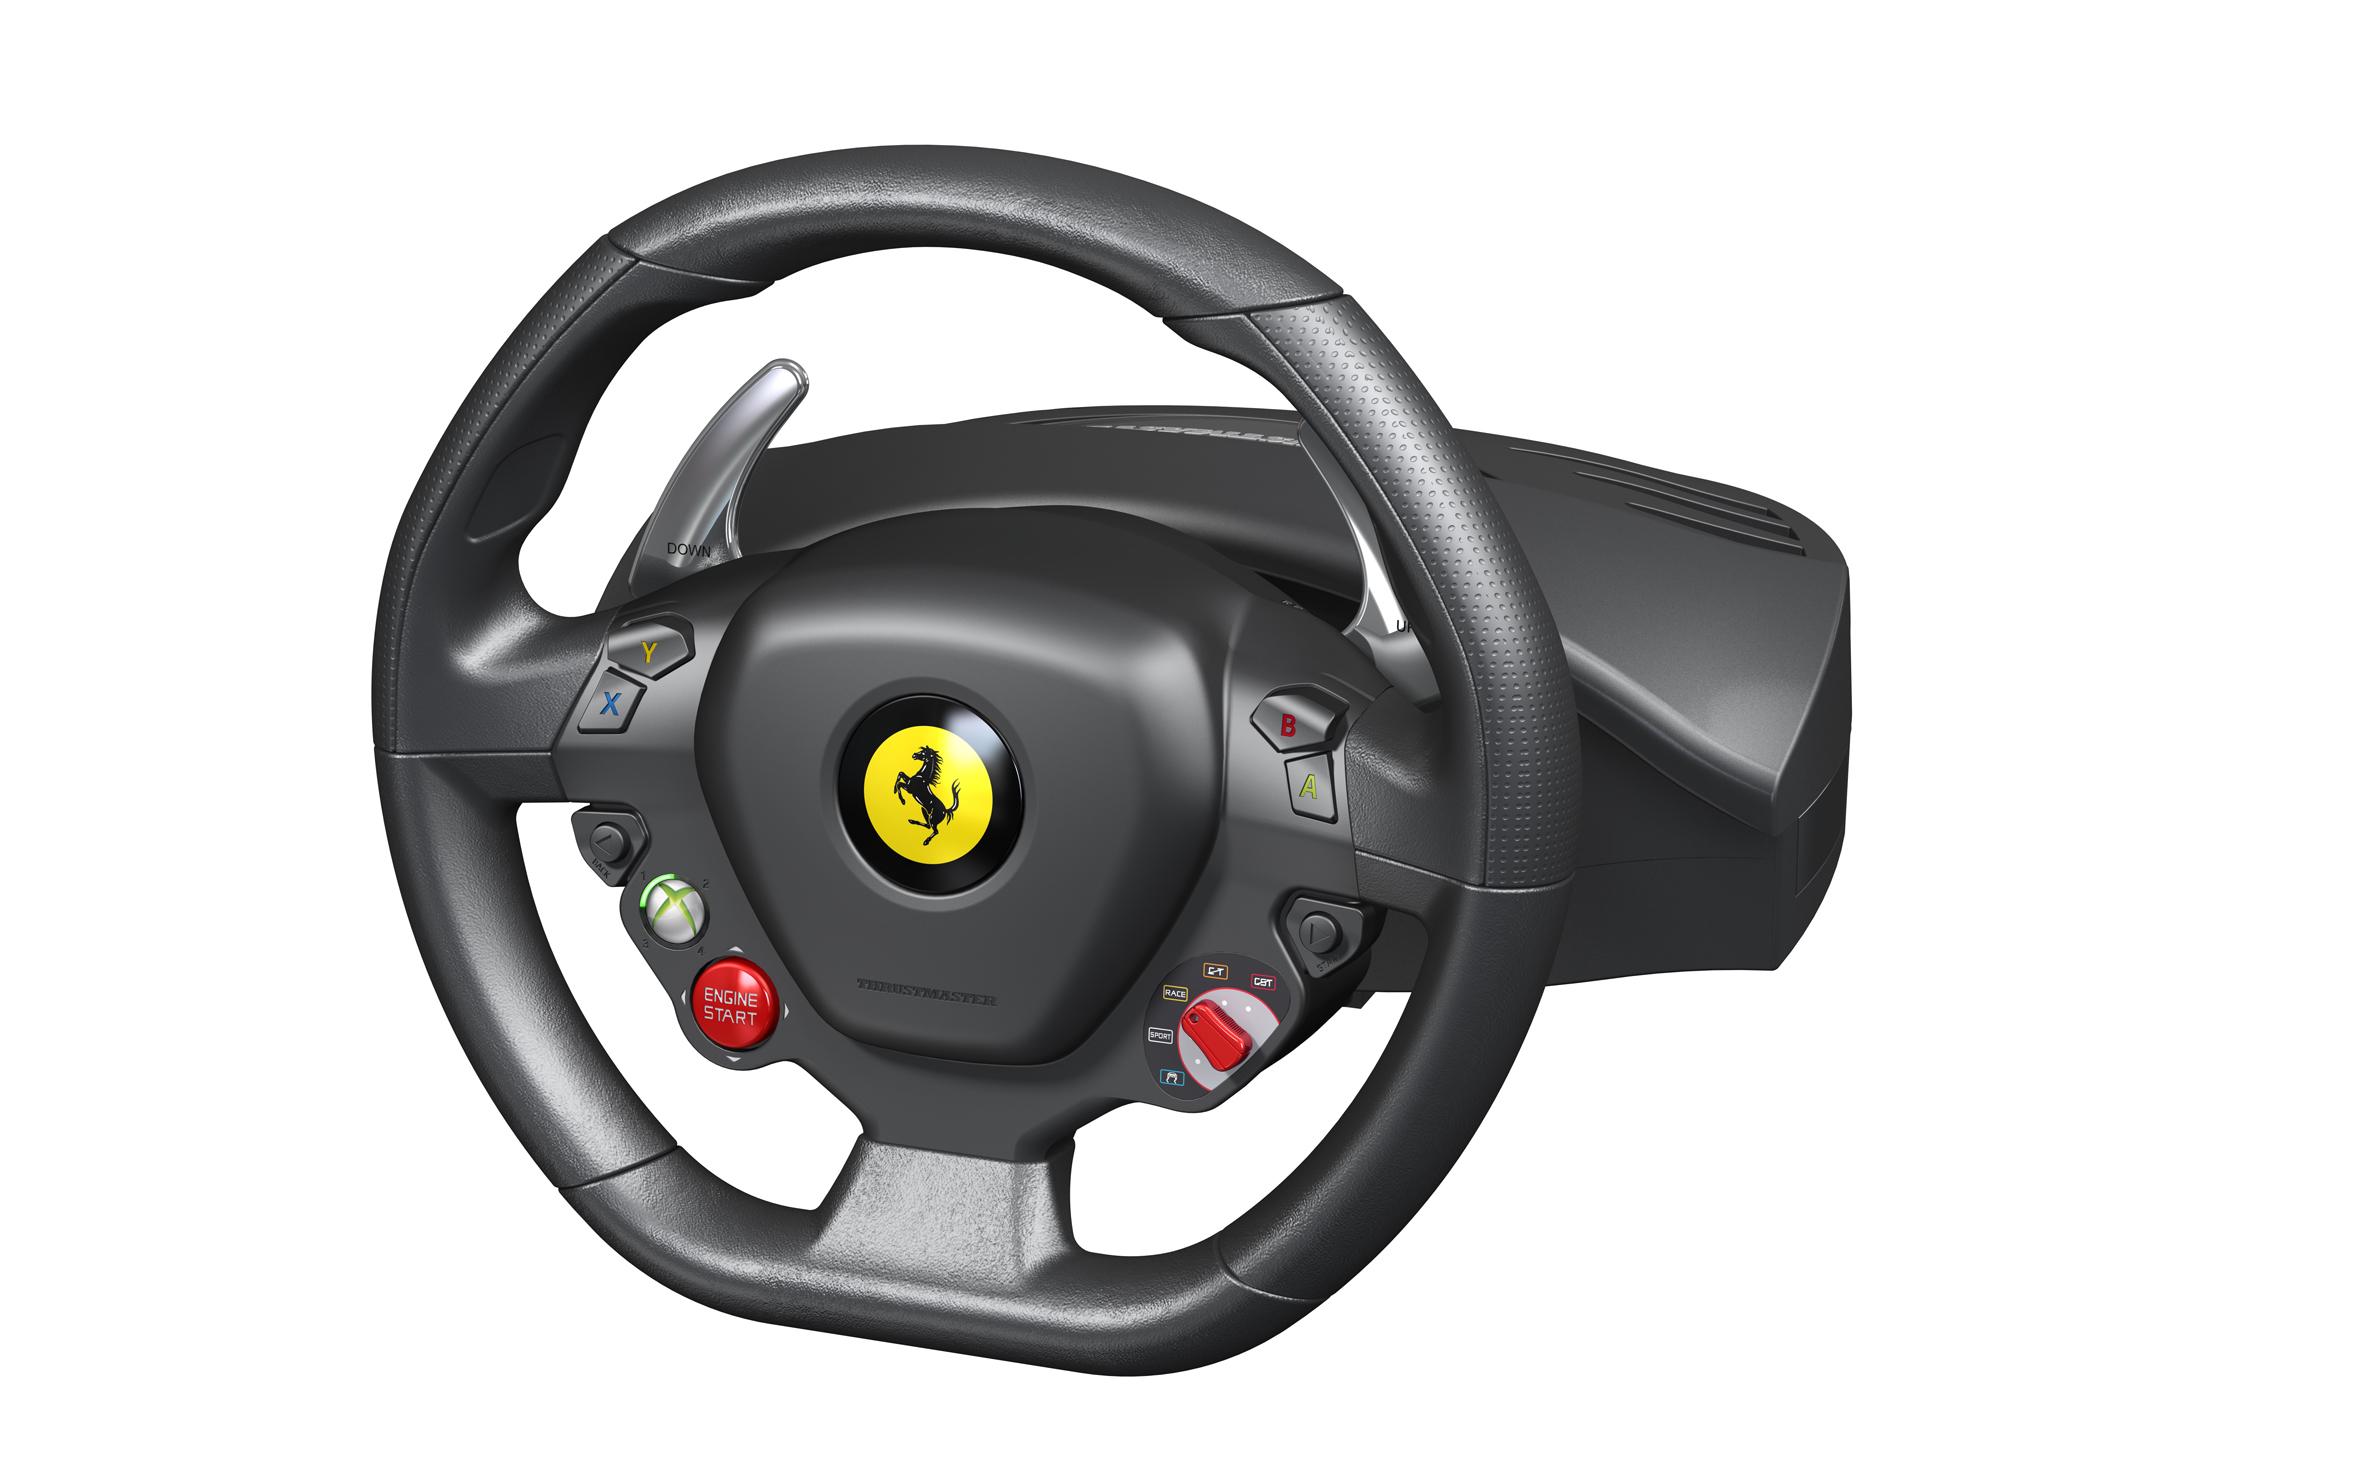 Thrustmaster unveil a fleet of Ferrari peripherals